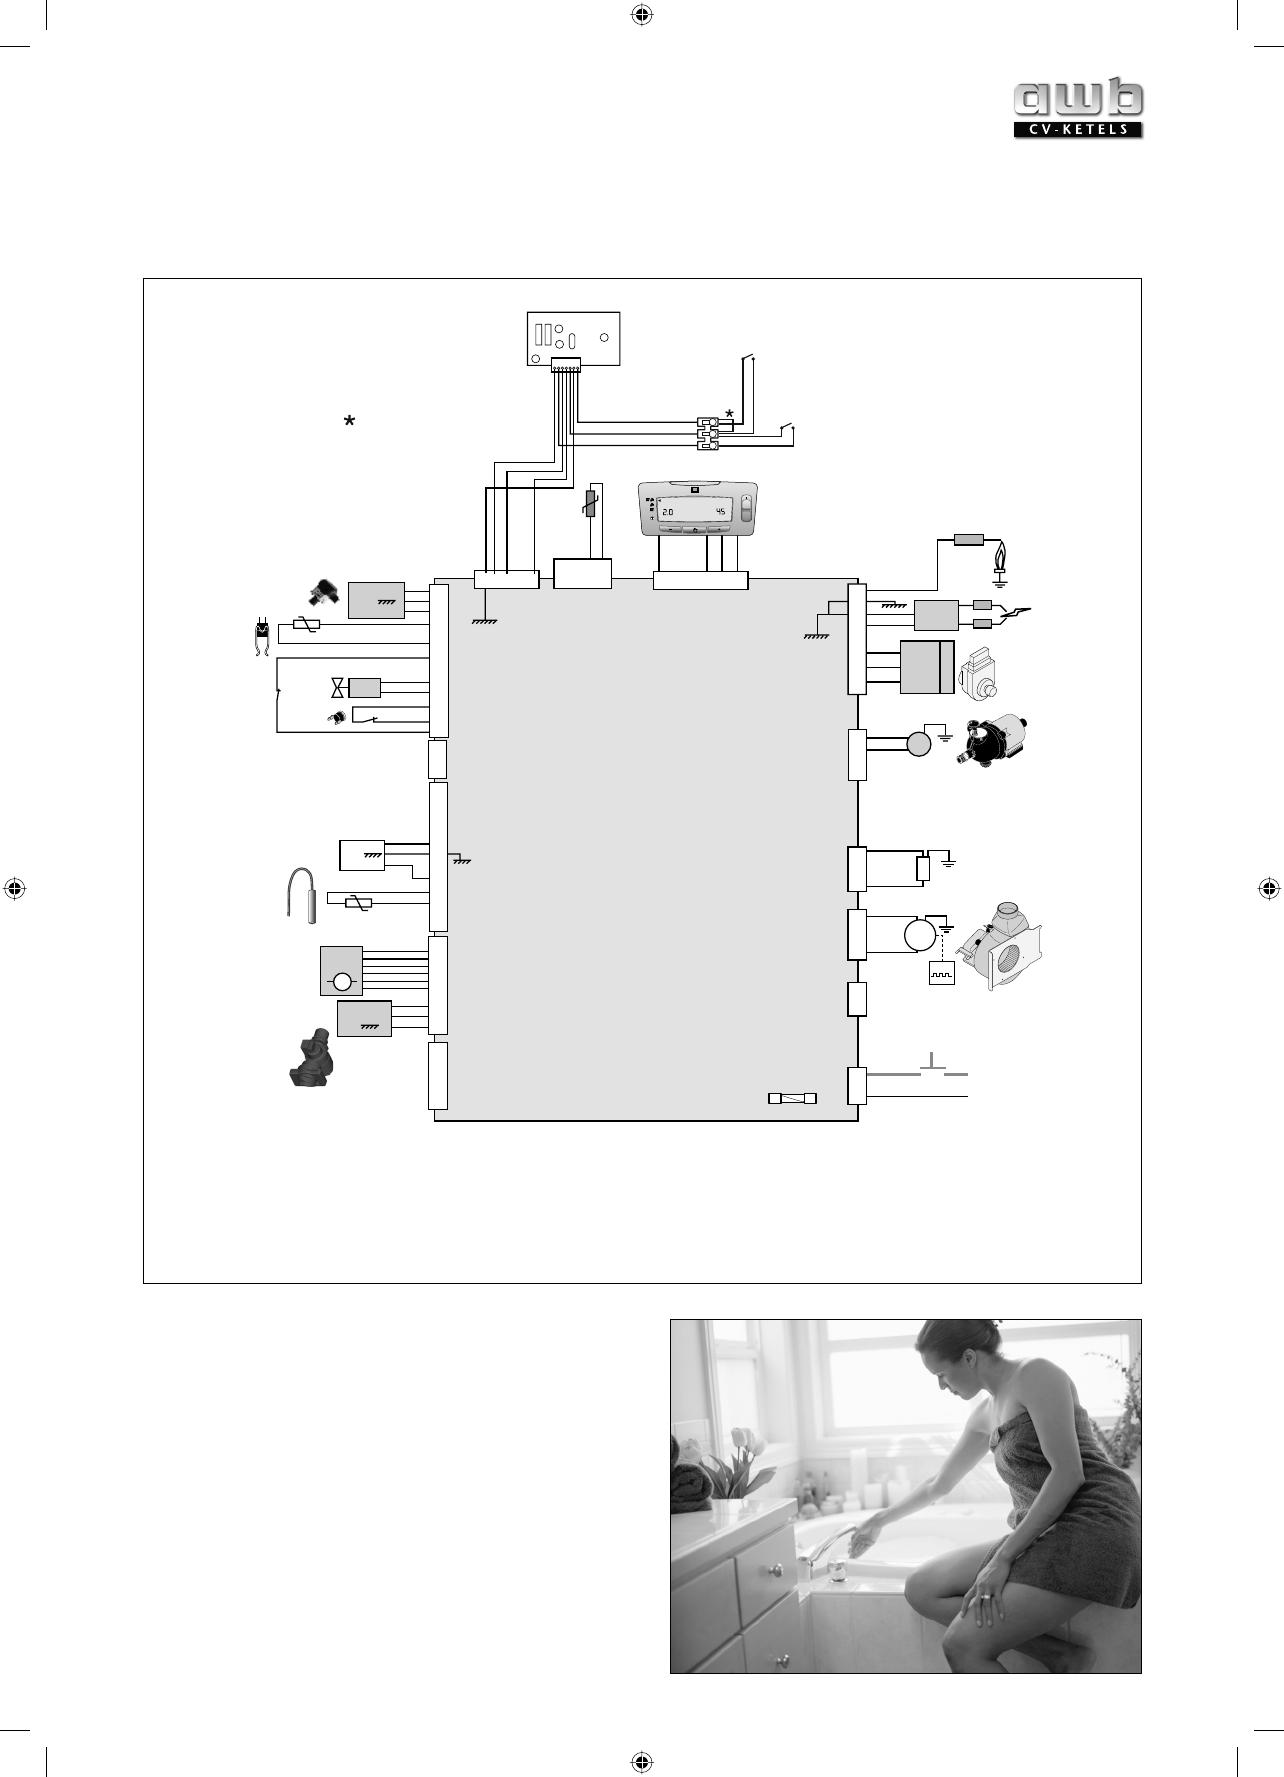 Ongekend Handleiding AWB Thermomaster VR 24 (pagina 1 van 24) (Nederlands) VT-83